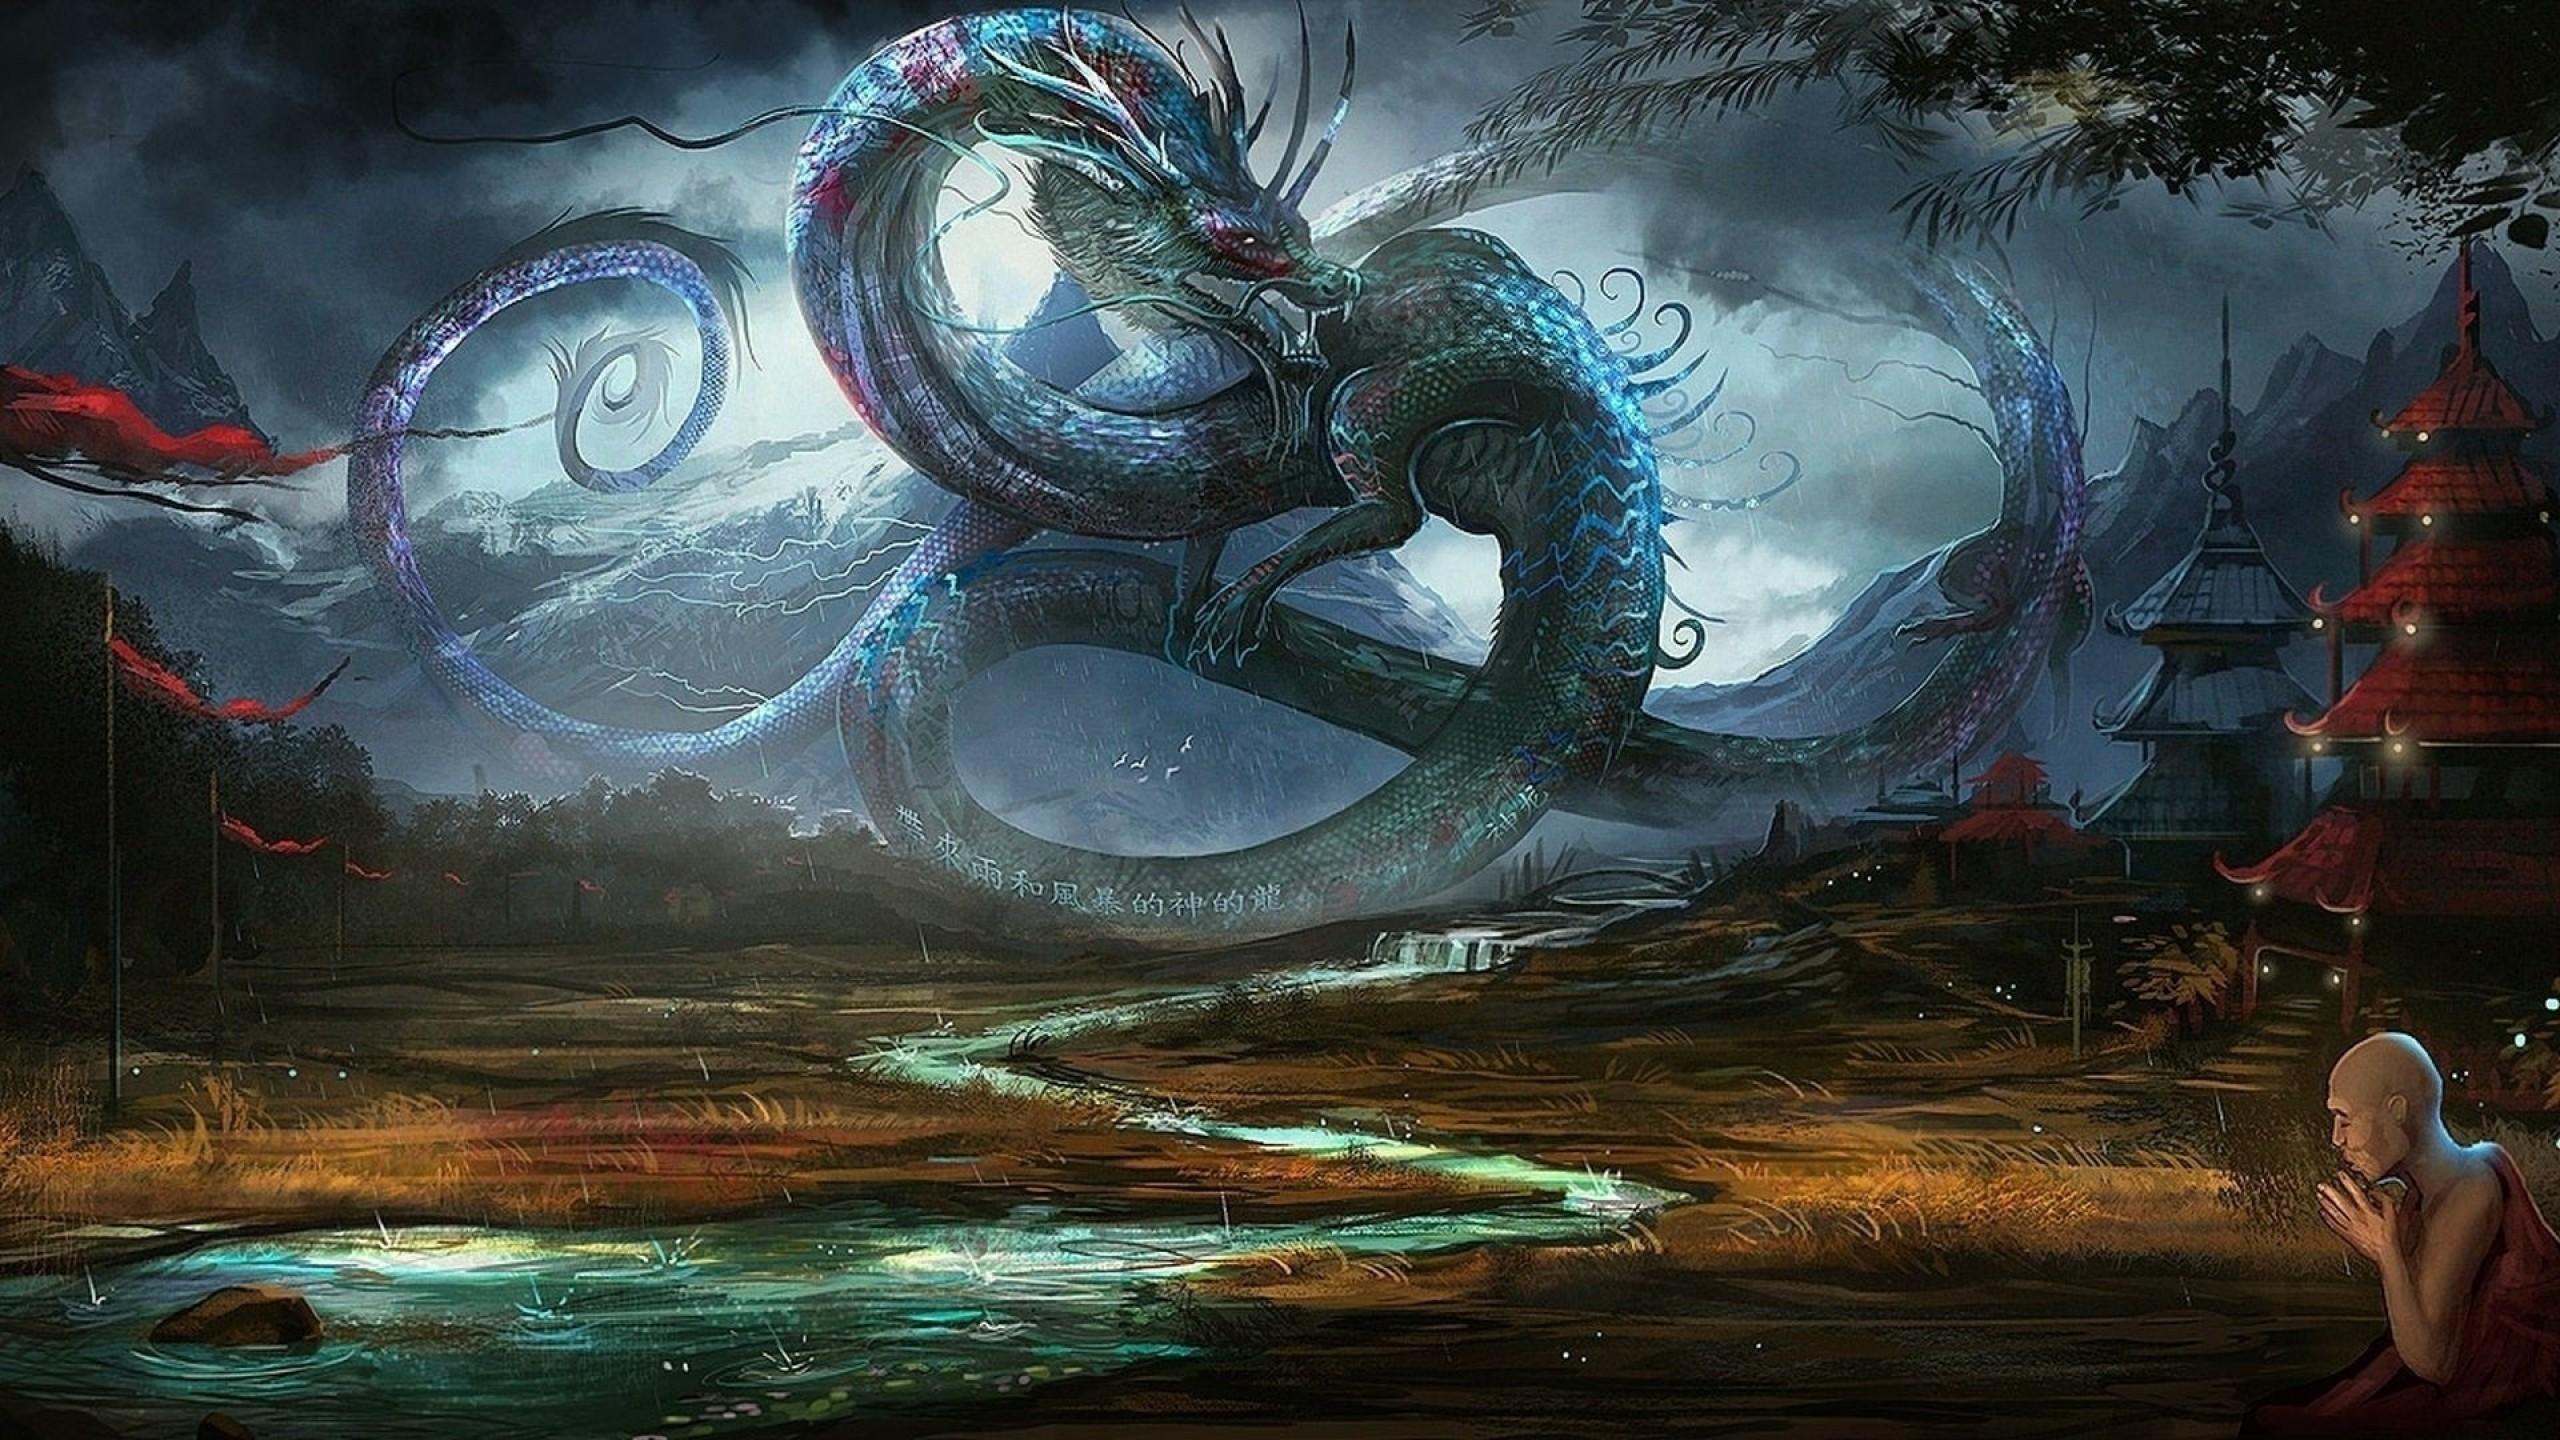 Res: 2560x1440, Shen Long wallpaper